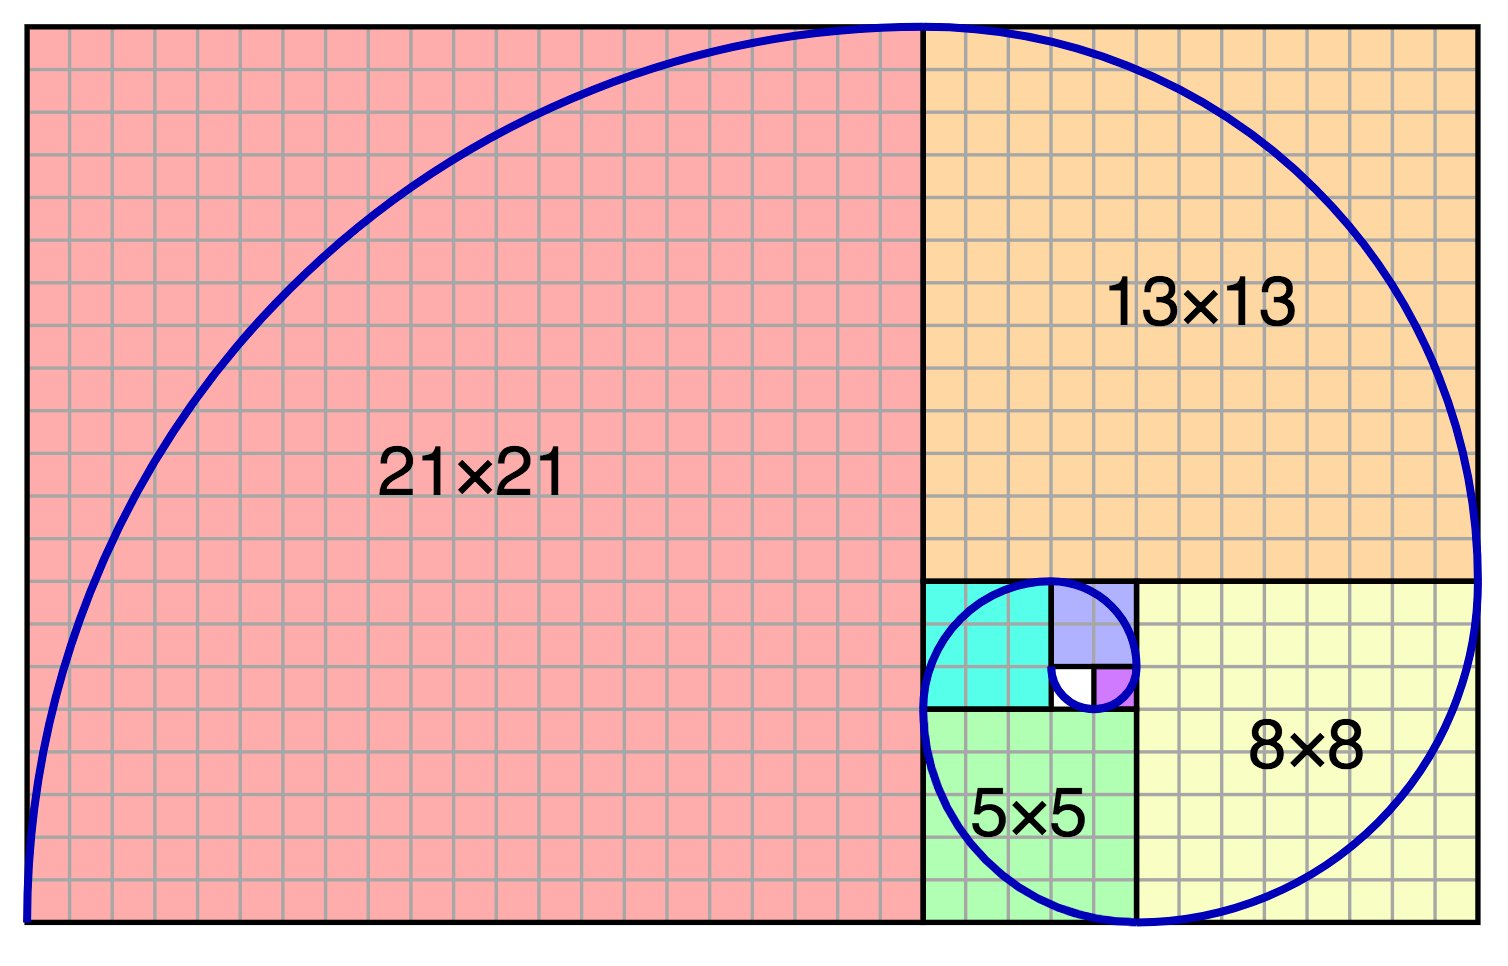 fermat u0026 39 s library on twitter   u0026quot fibonacci spiral is created